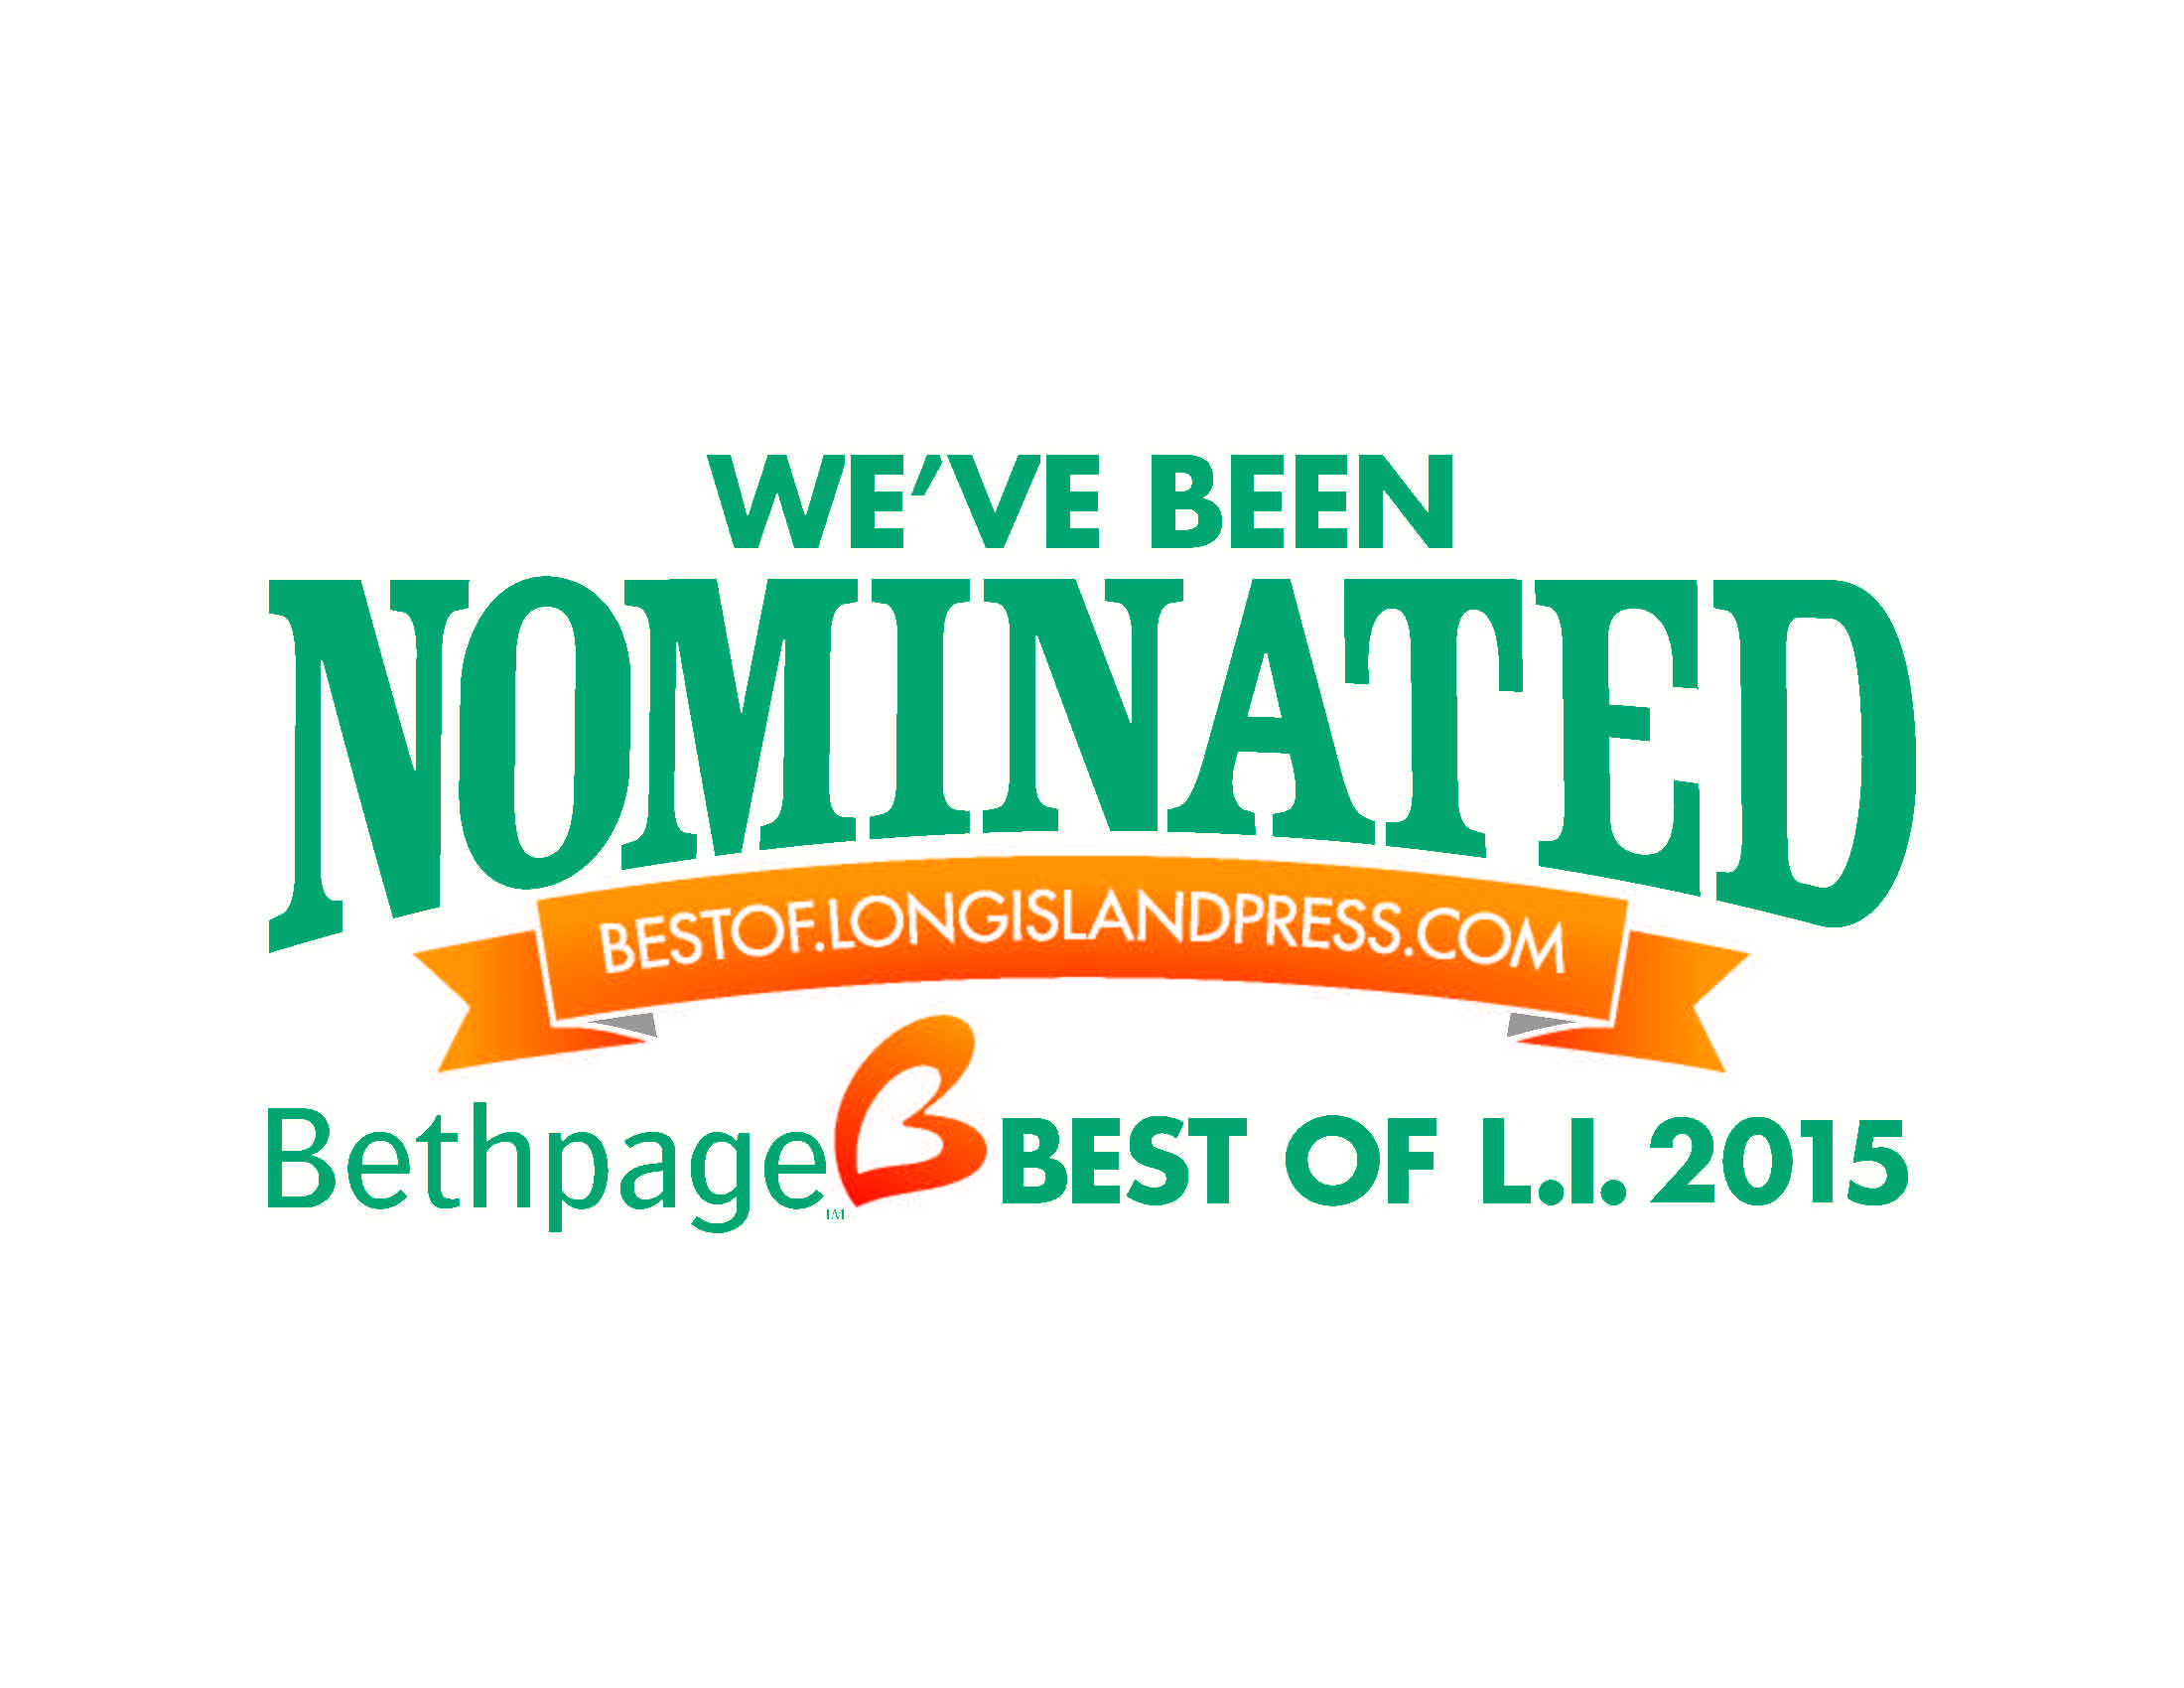 Bethpagebestofnominated 2015 1